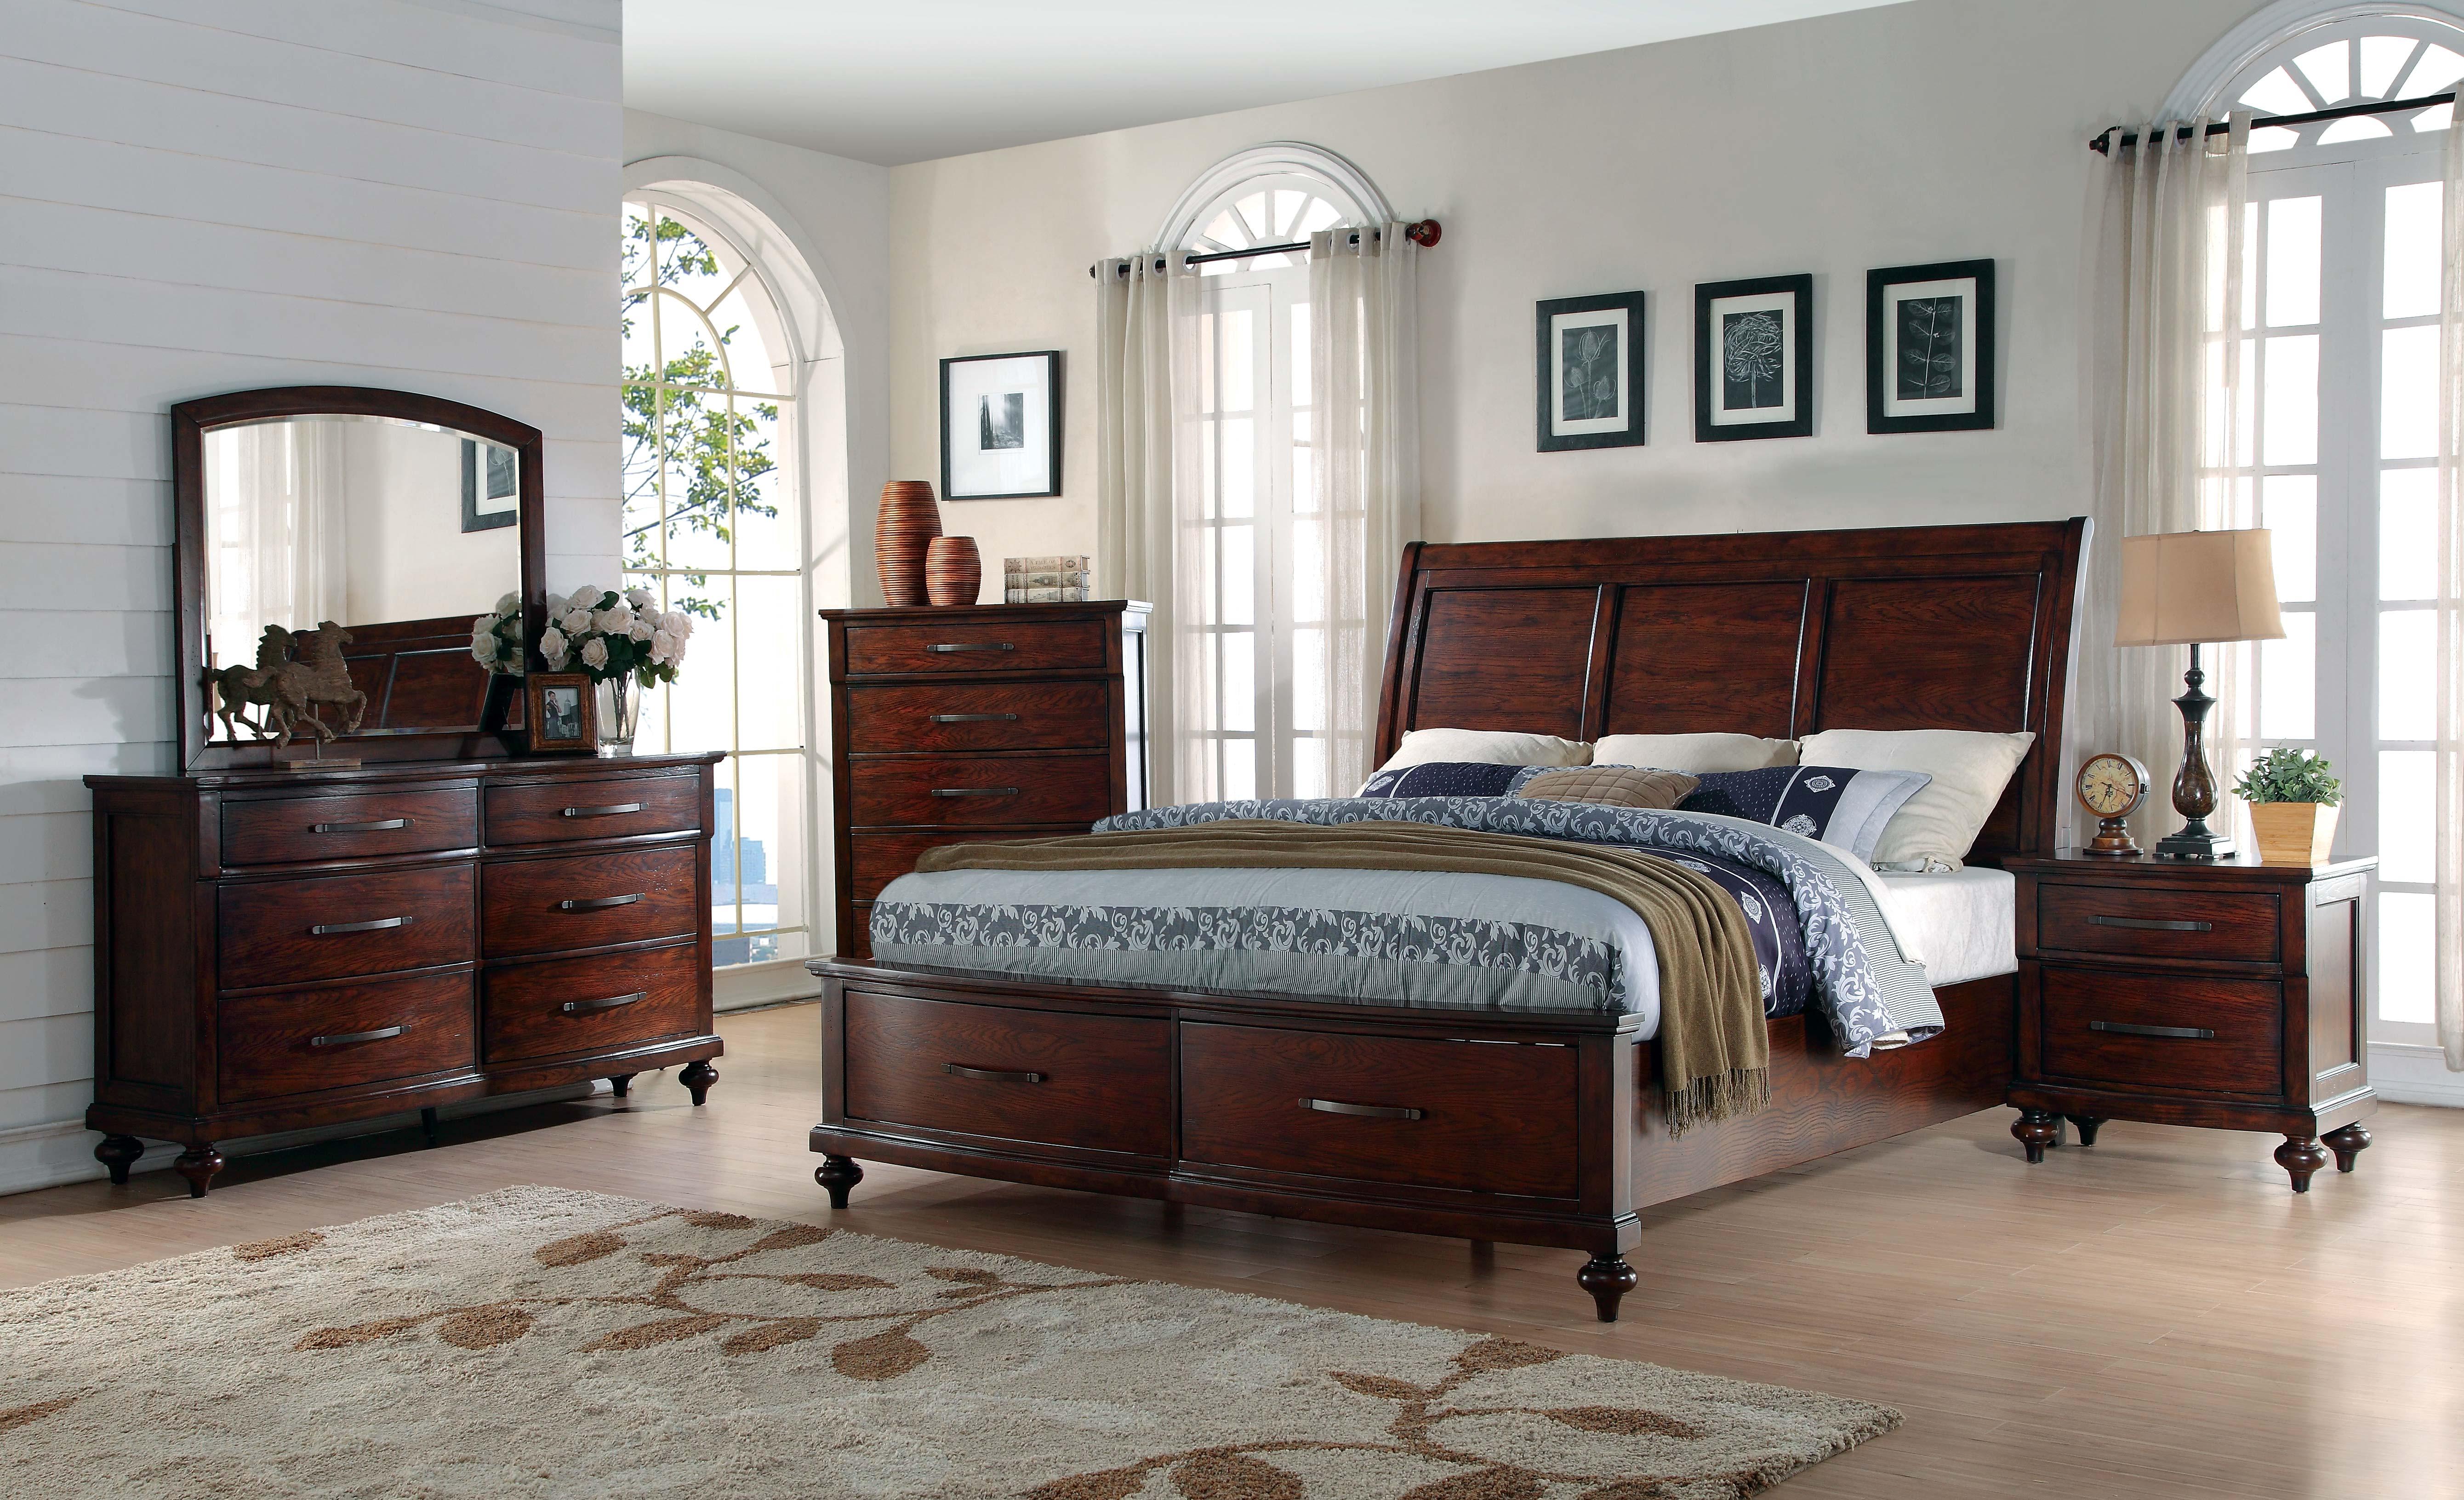 Merveilleux B1033B La Jolla Ranchero Storage Bedroom